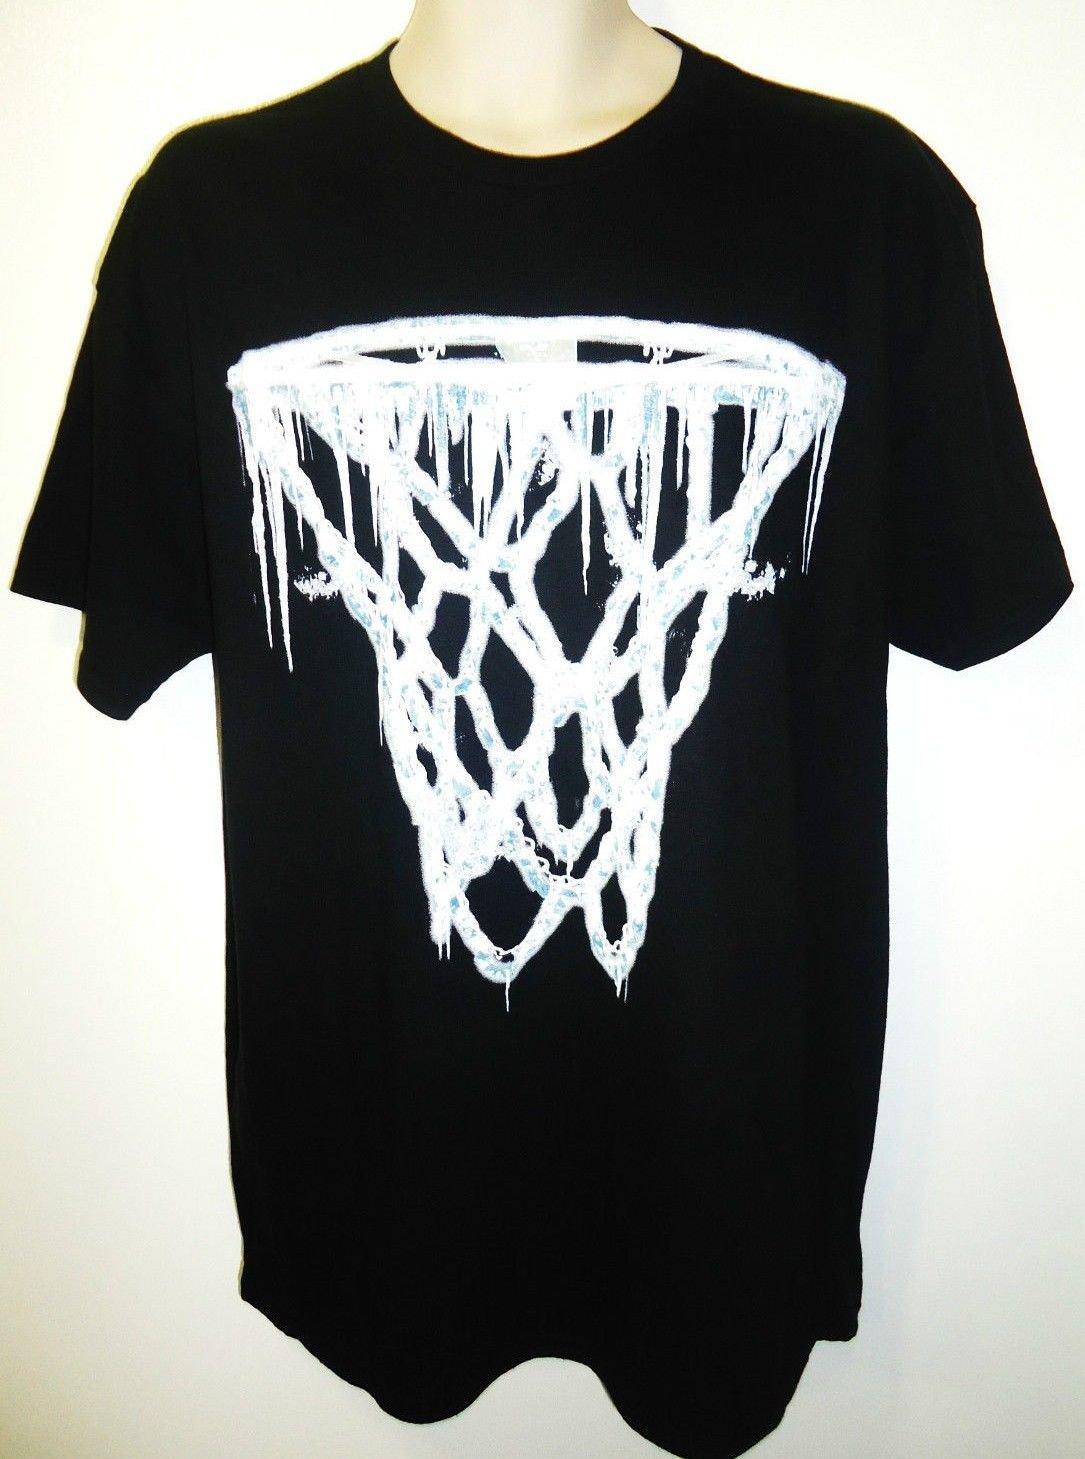 YOUNG & WILD - WINTER - BASKETBALL -  HOOP - BLACK - T-SHIRT - LARGE - NEW - NBA